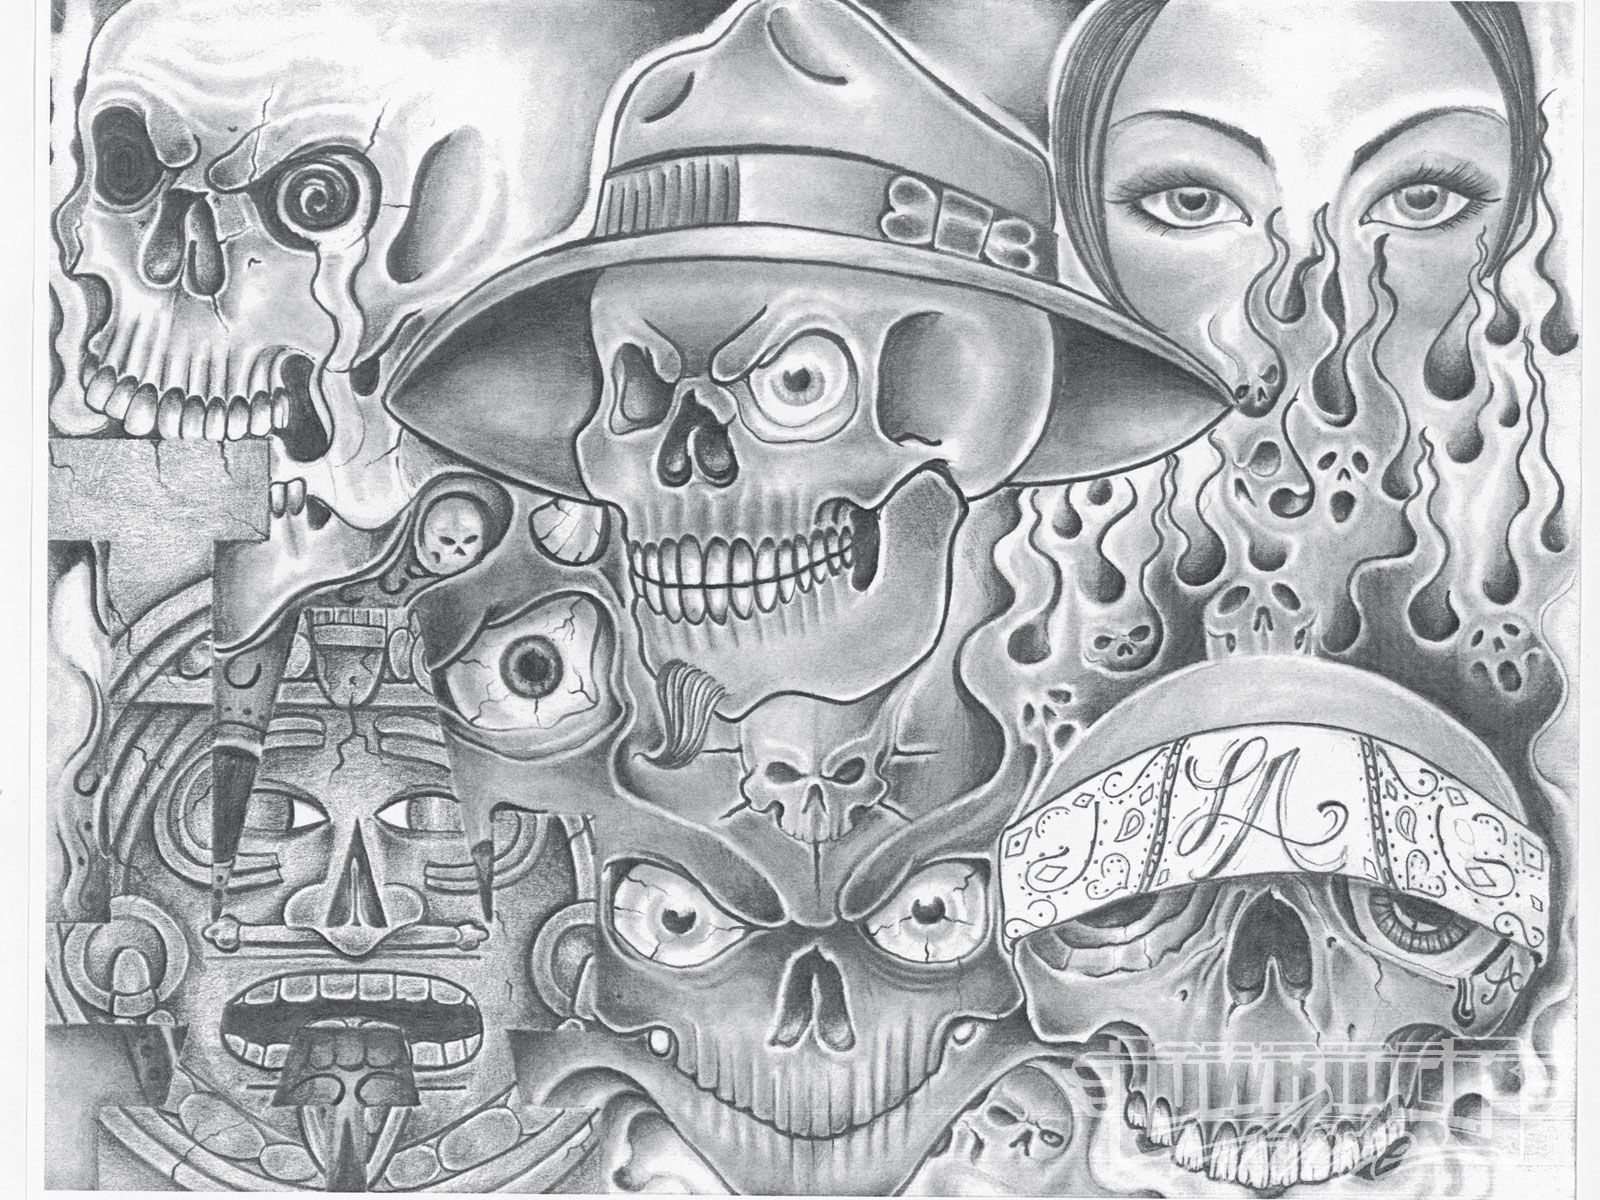 Lowrider Arte Wallpapers Lowrider Art Chicano Drawings Prison Art